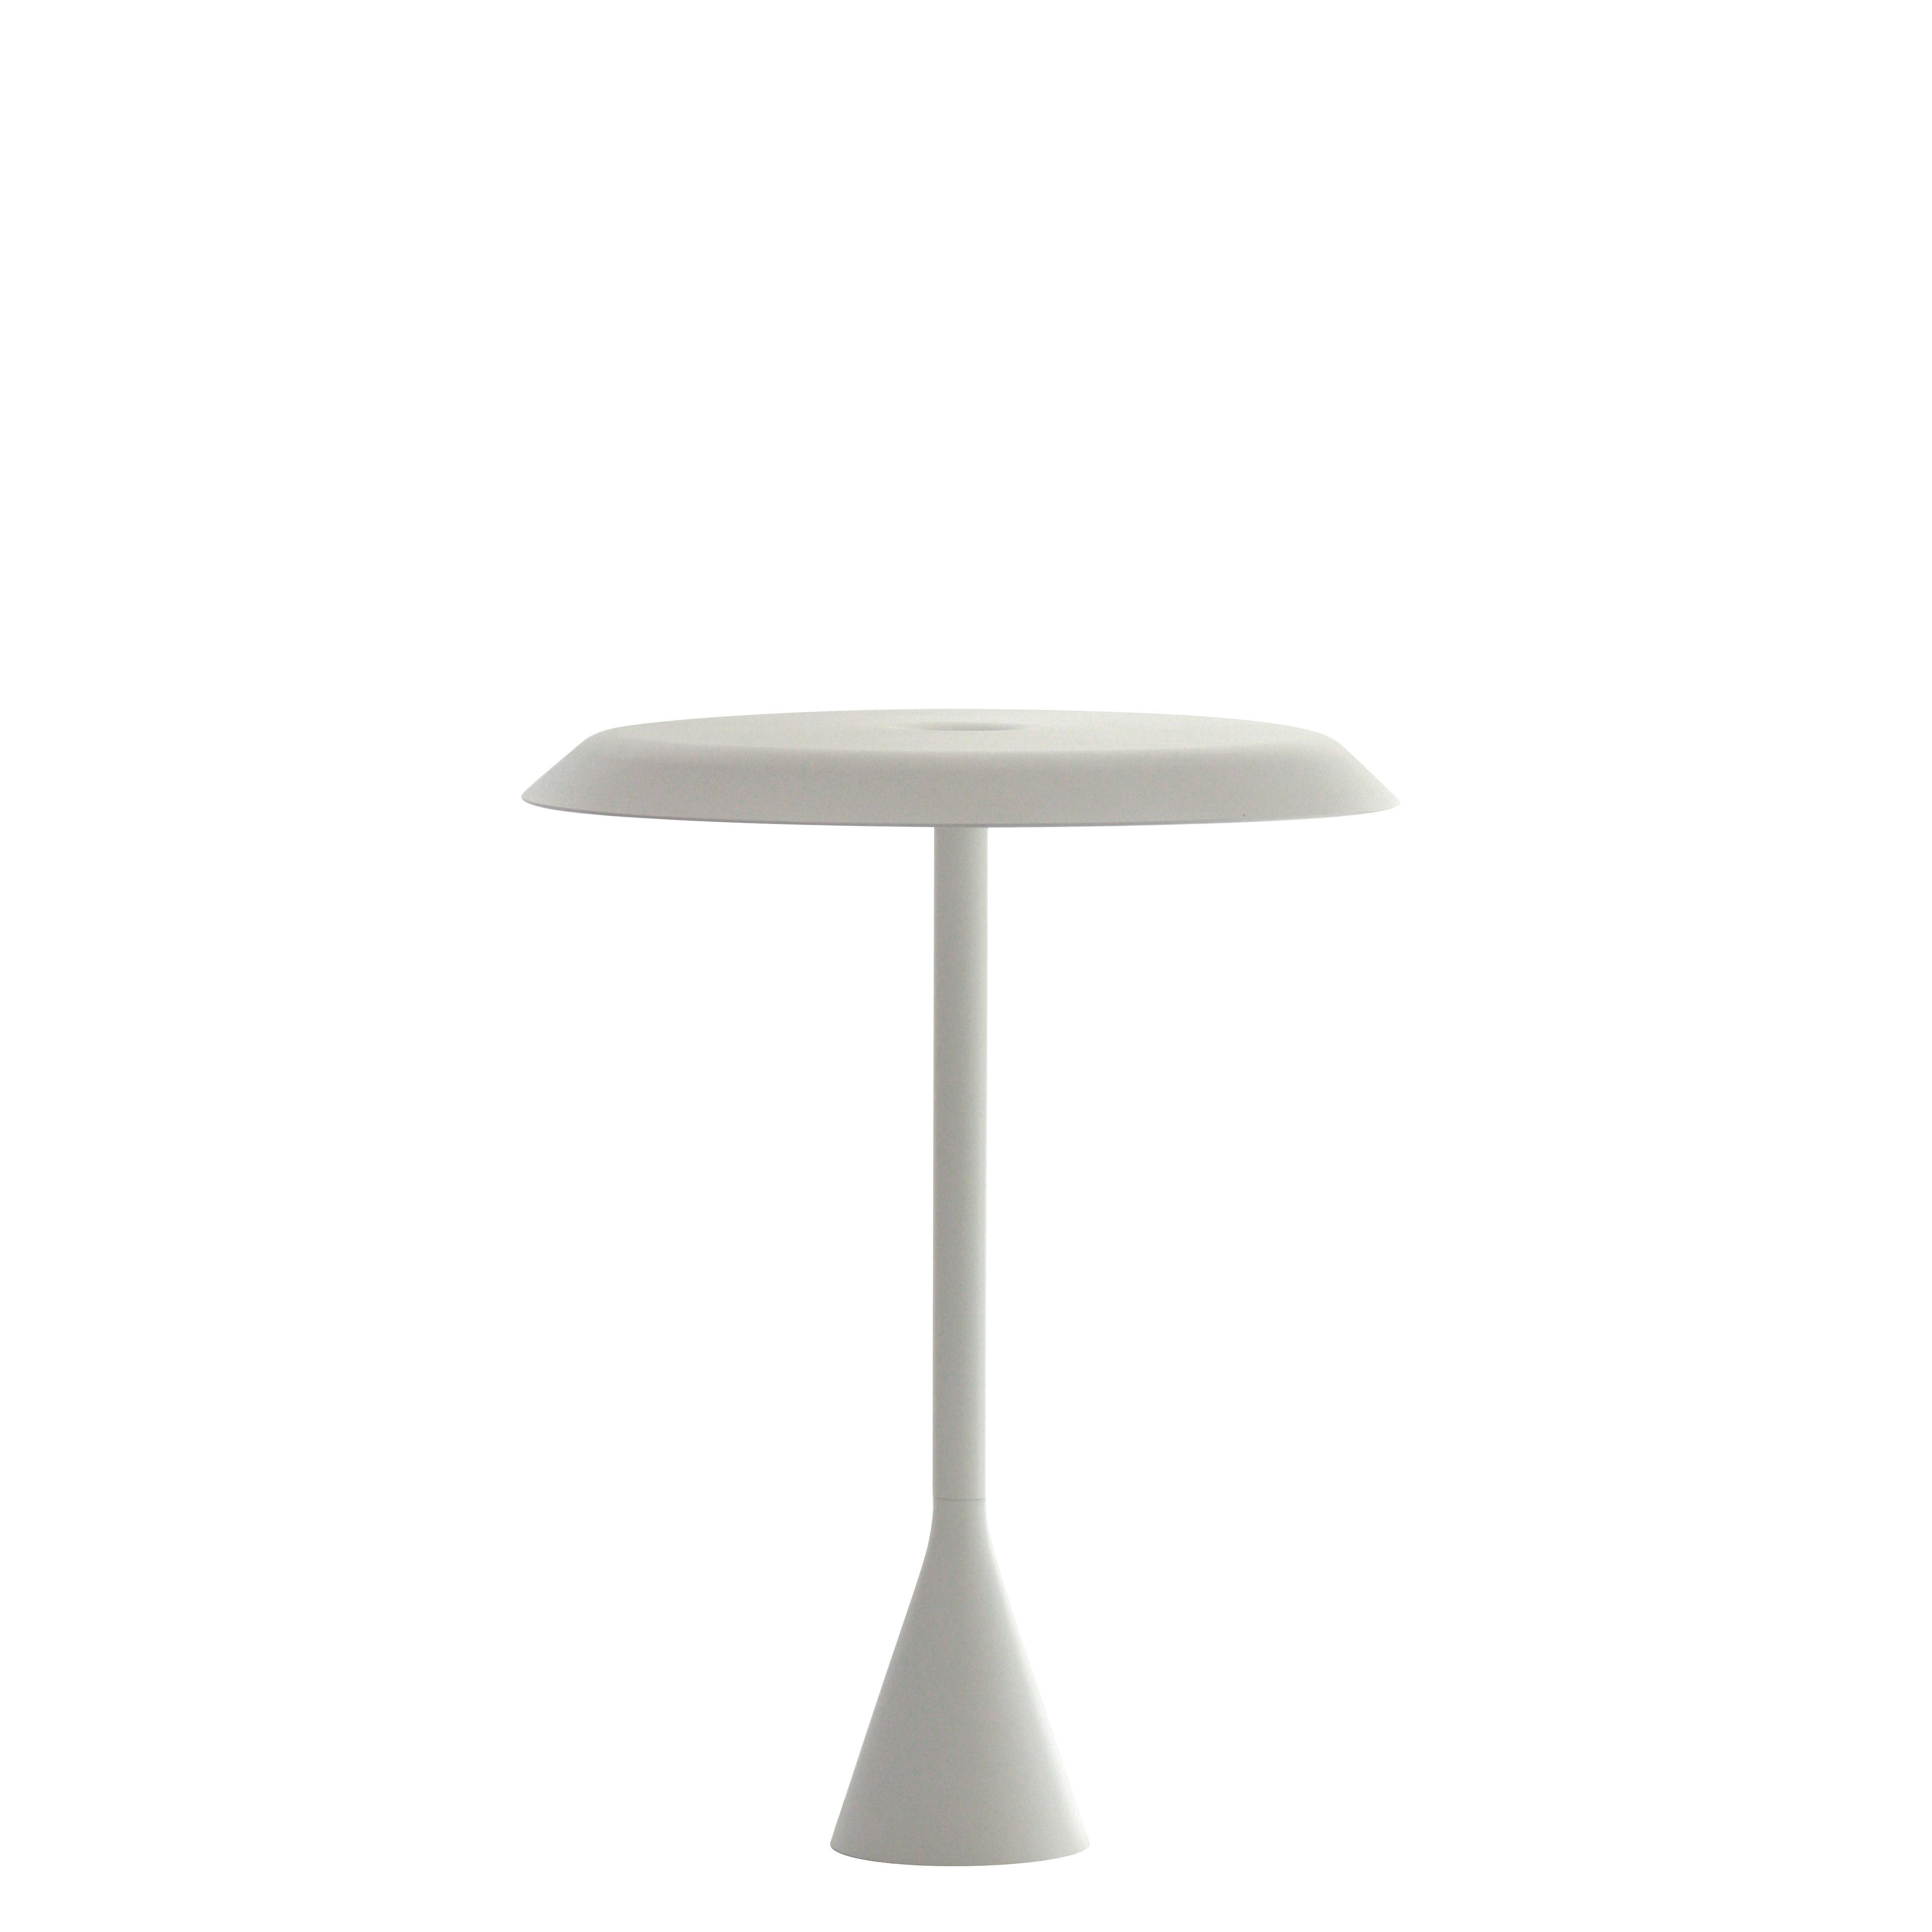 Luminaire - Lampes de table - Lampe sans fil Panama Mini LED / Aluminium - H 30 cm - Nemo - Blanc - Aluminium peint